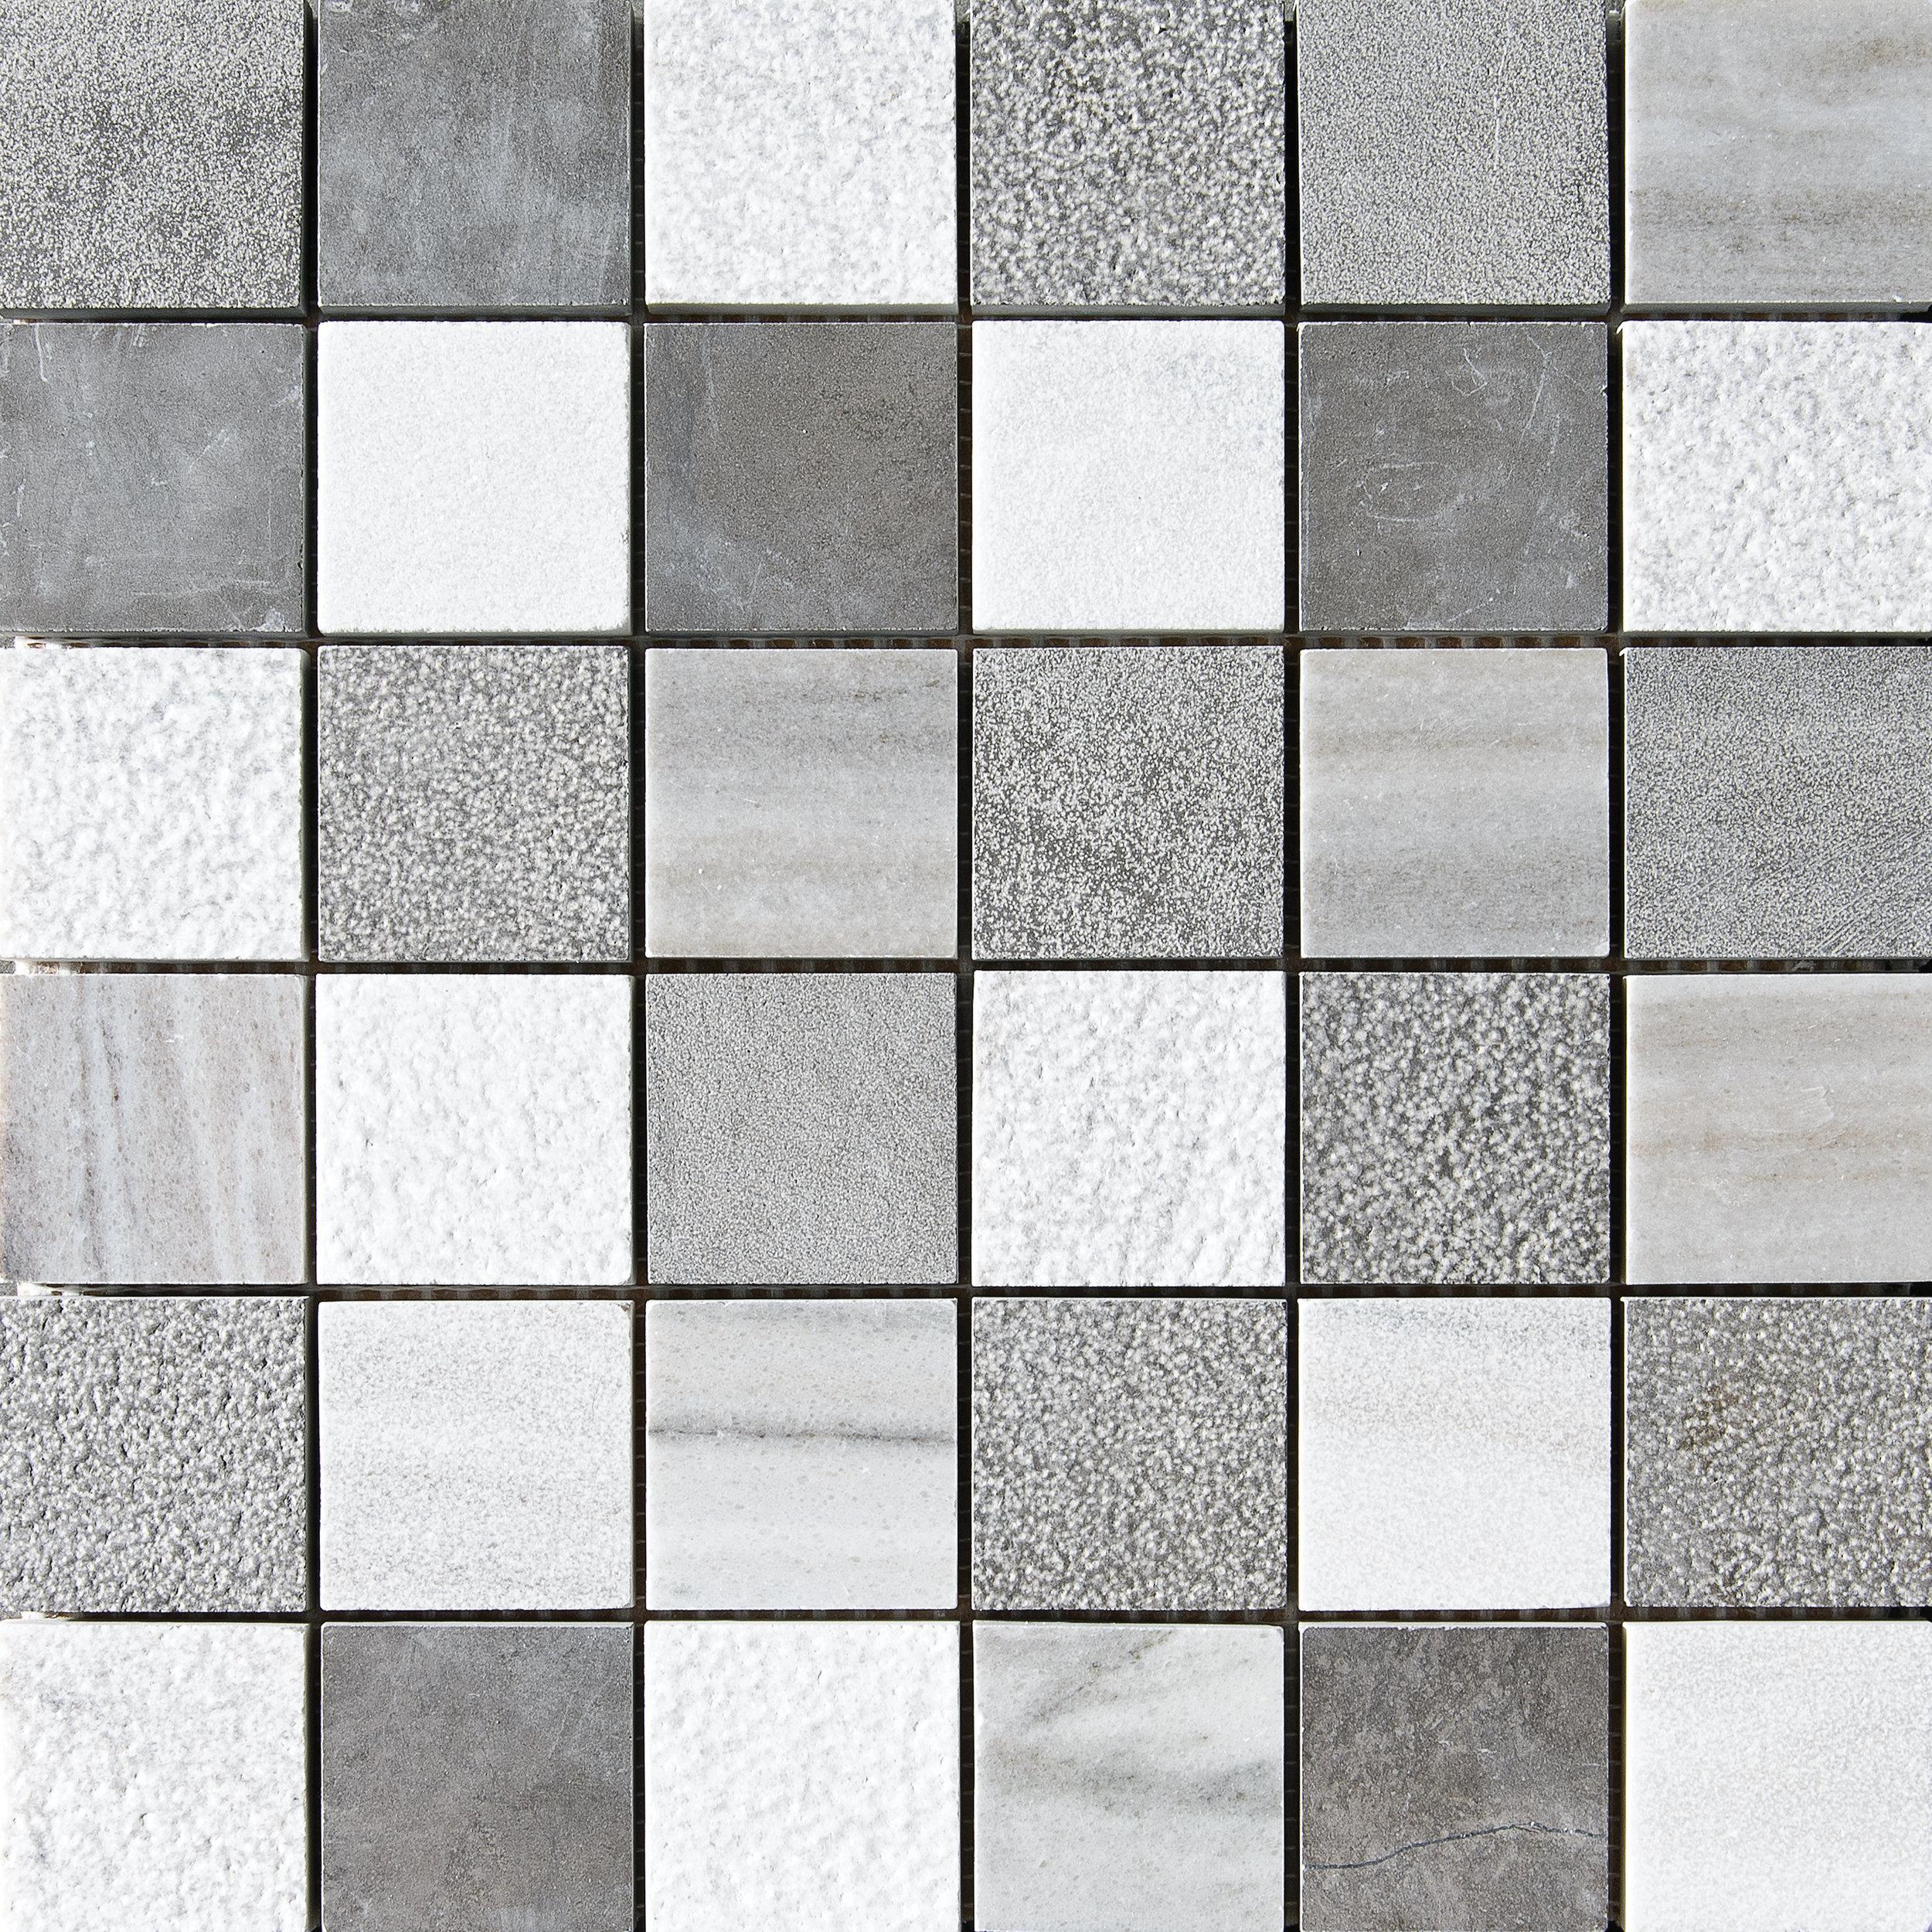 "MS01309 skyline & bosphorus 2""x2"" textured mosaic 12""x12""x3/8"" sheets"